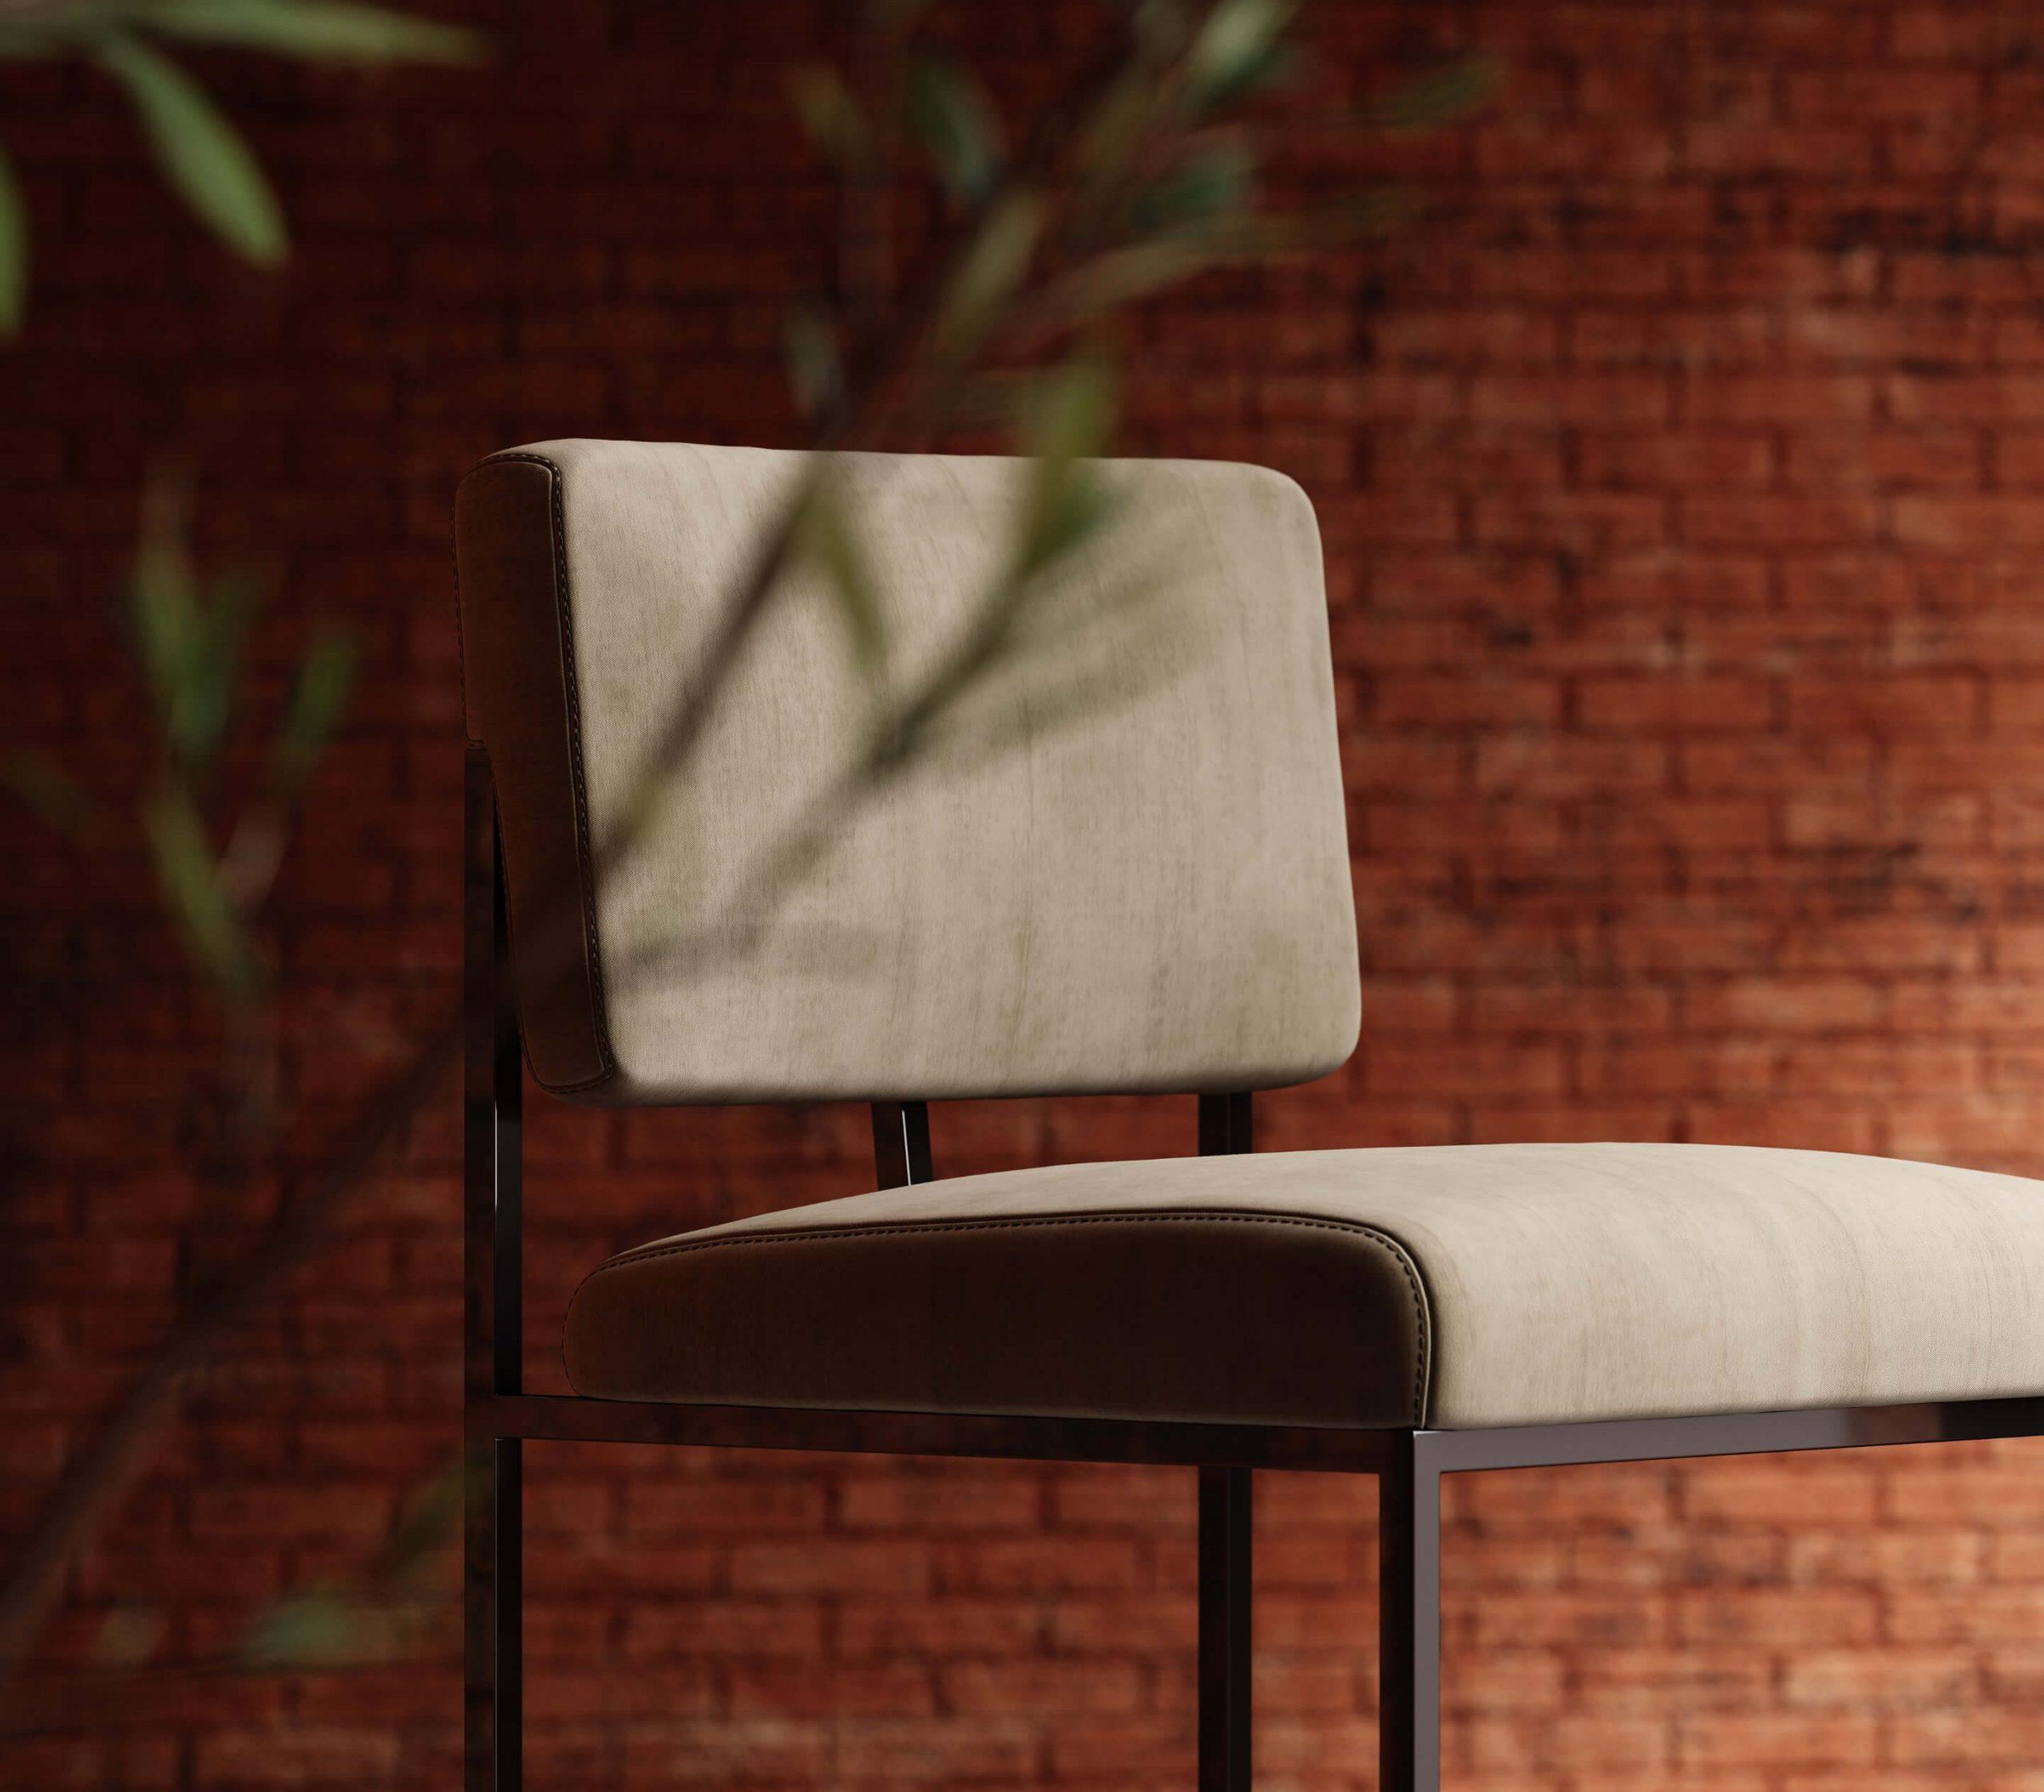 gram-bar-chair-hospitality-projects-black-steel-structure-velvet-masculine-industrial-decor-domkapa-7